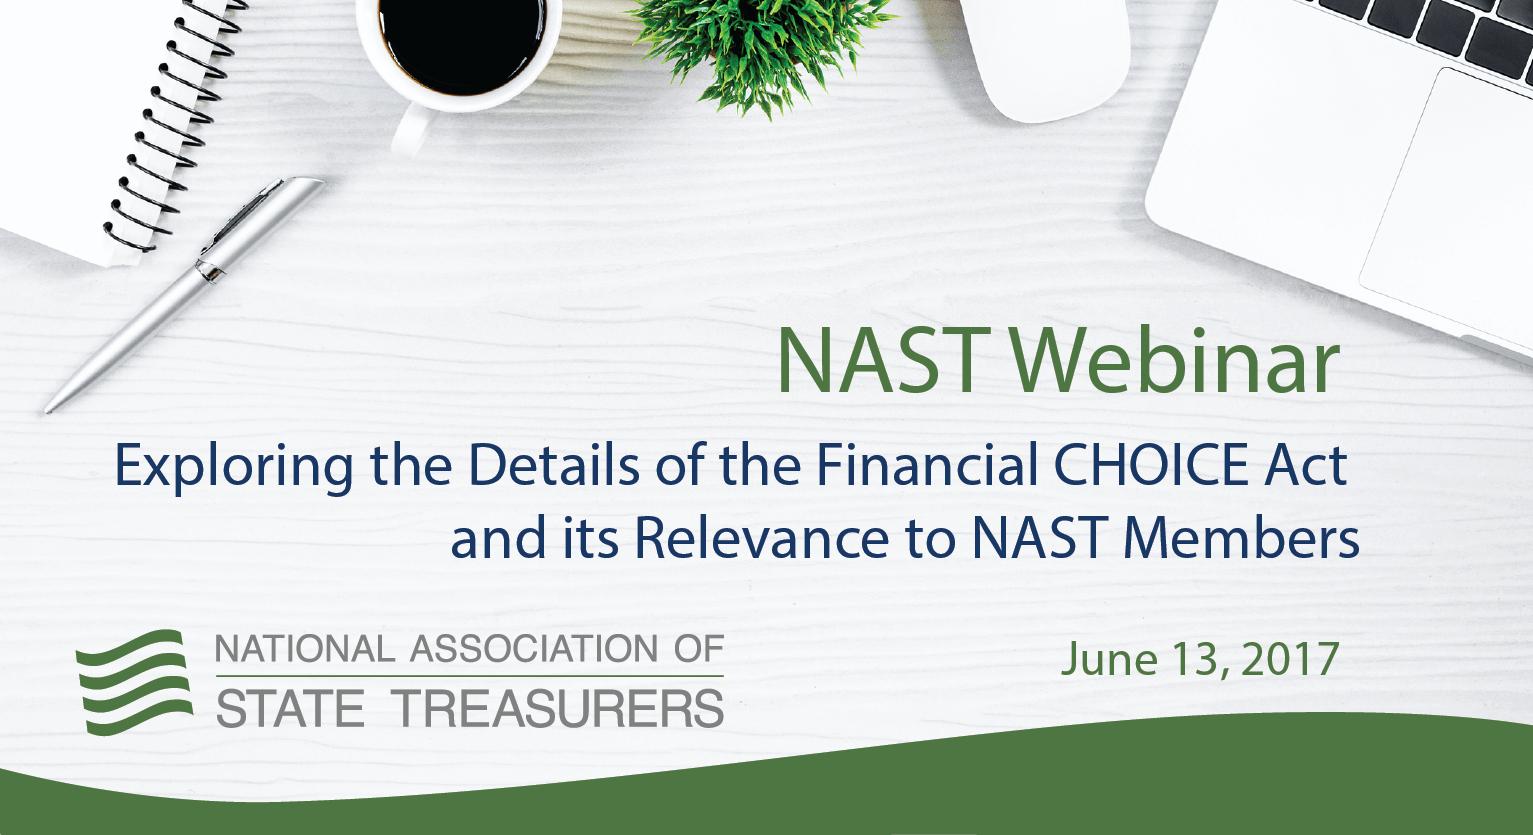 NAST Webinar - Financial CHOICE Act